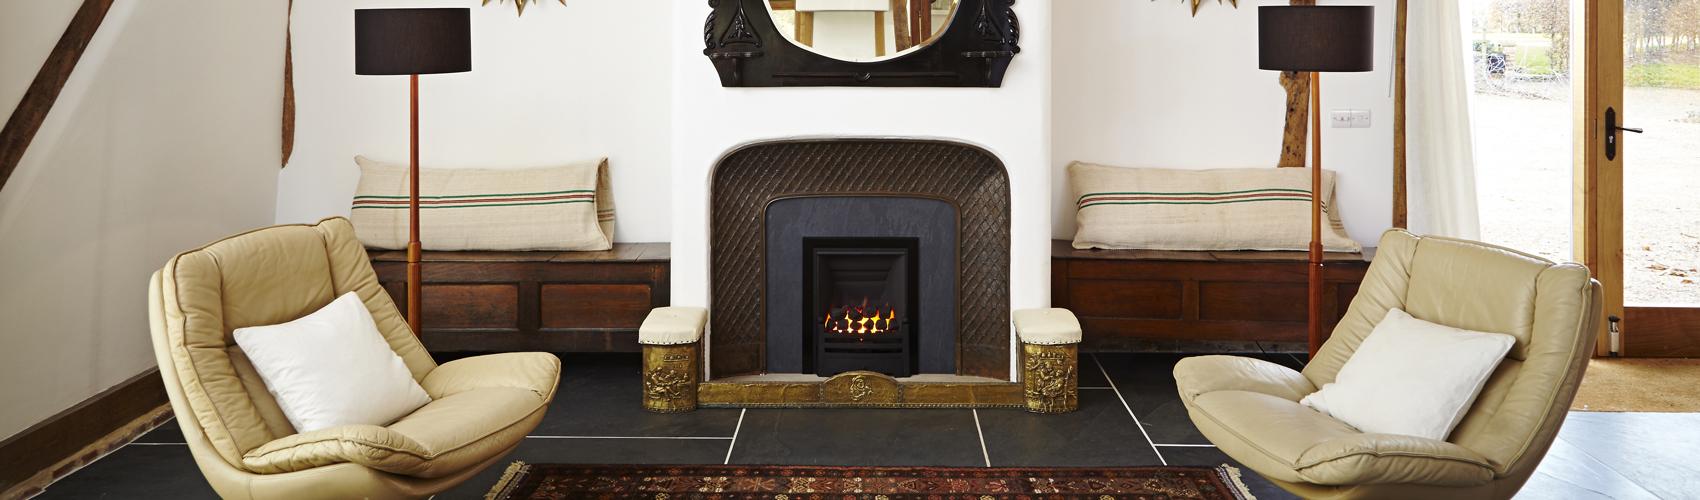 AB_Fireplace-059